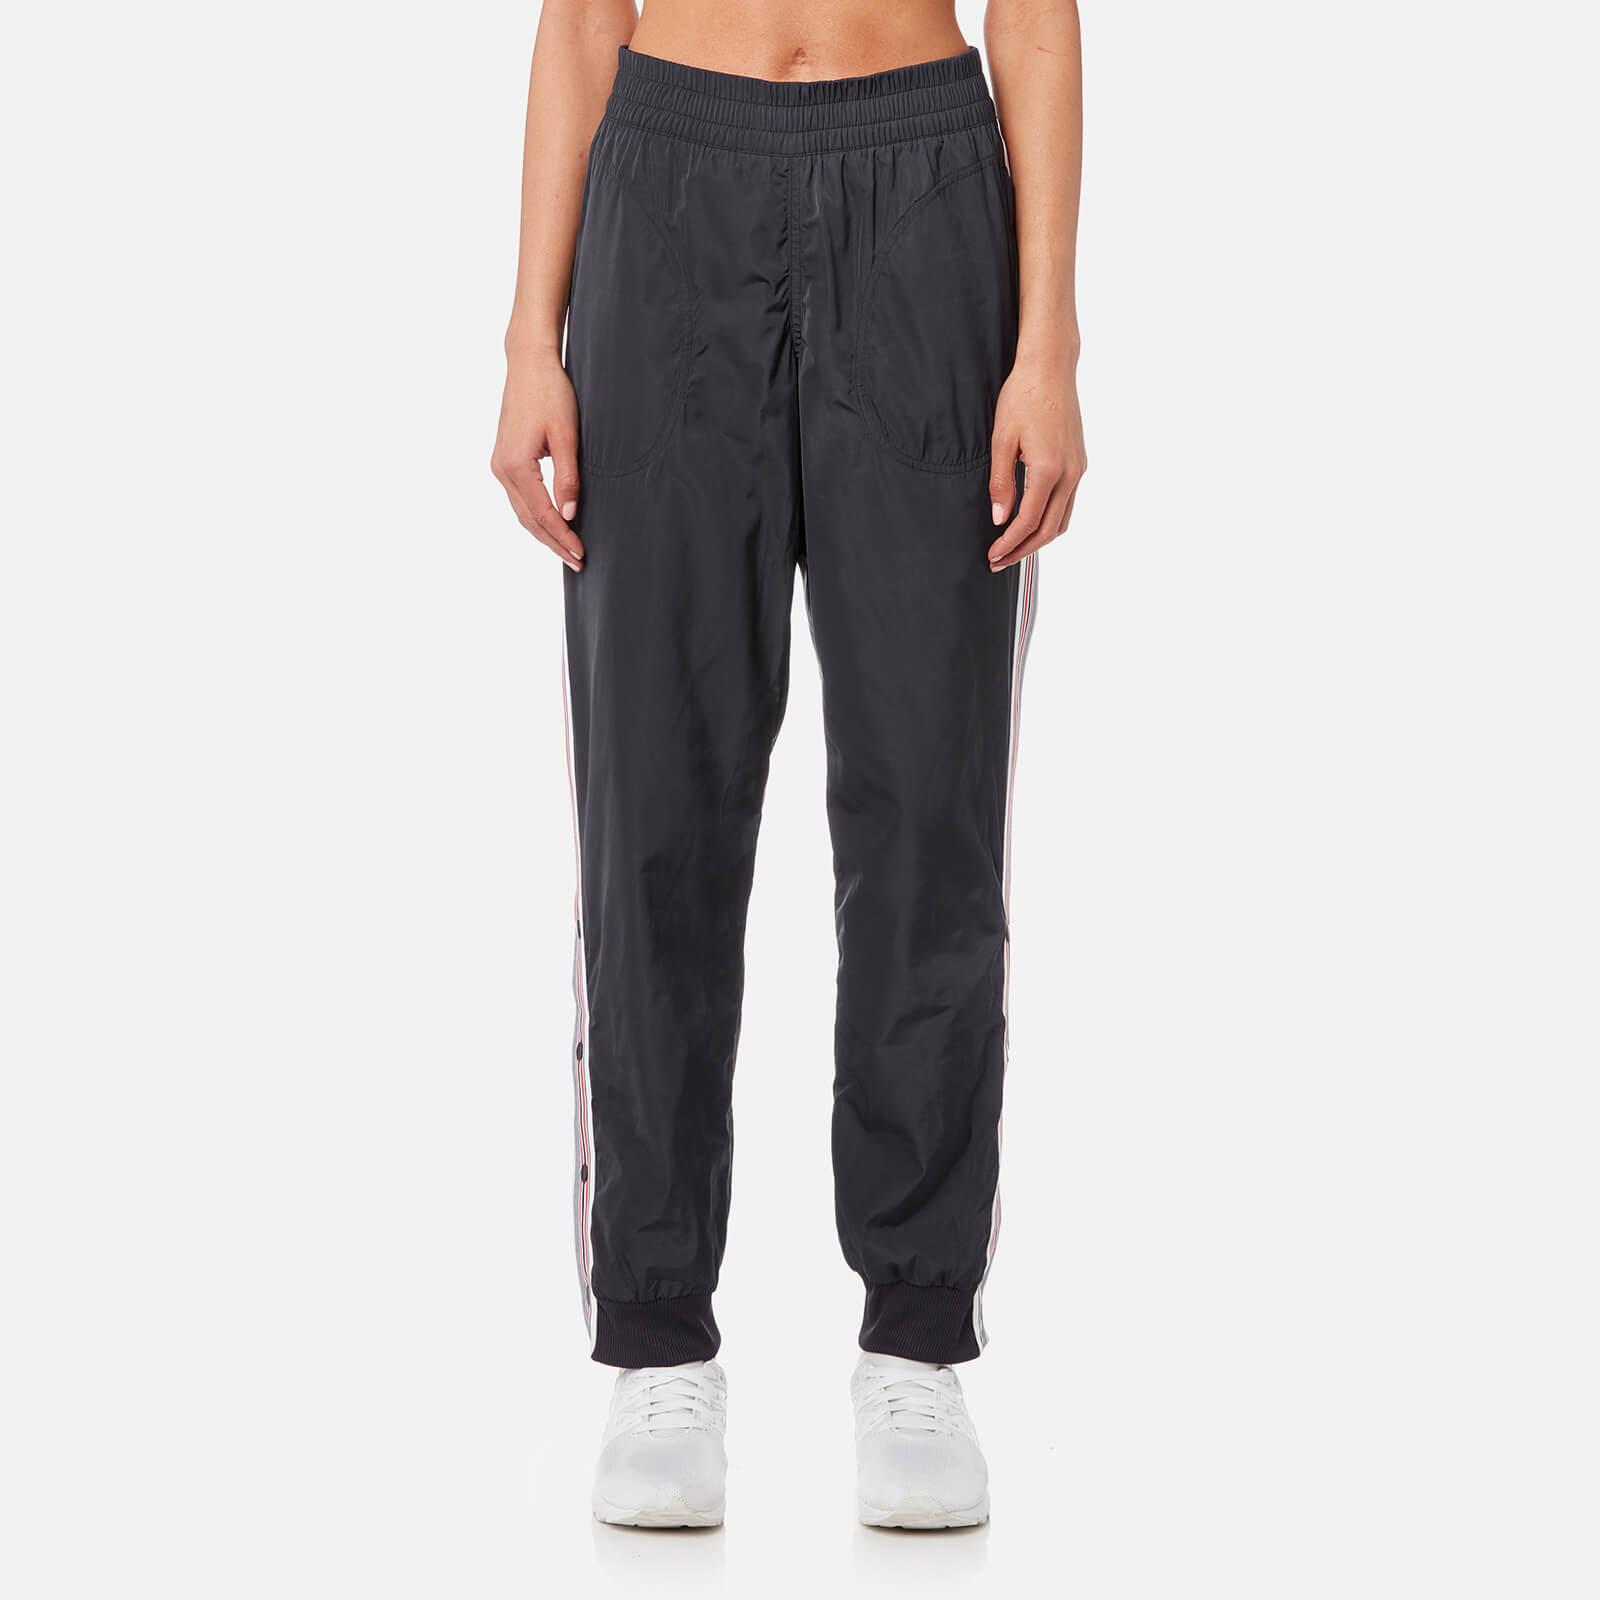 adidas by Stella McCartney Women's Train Track Pants - Night Grey